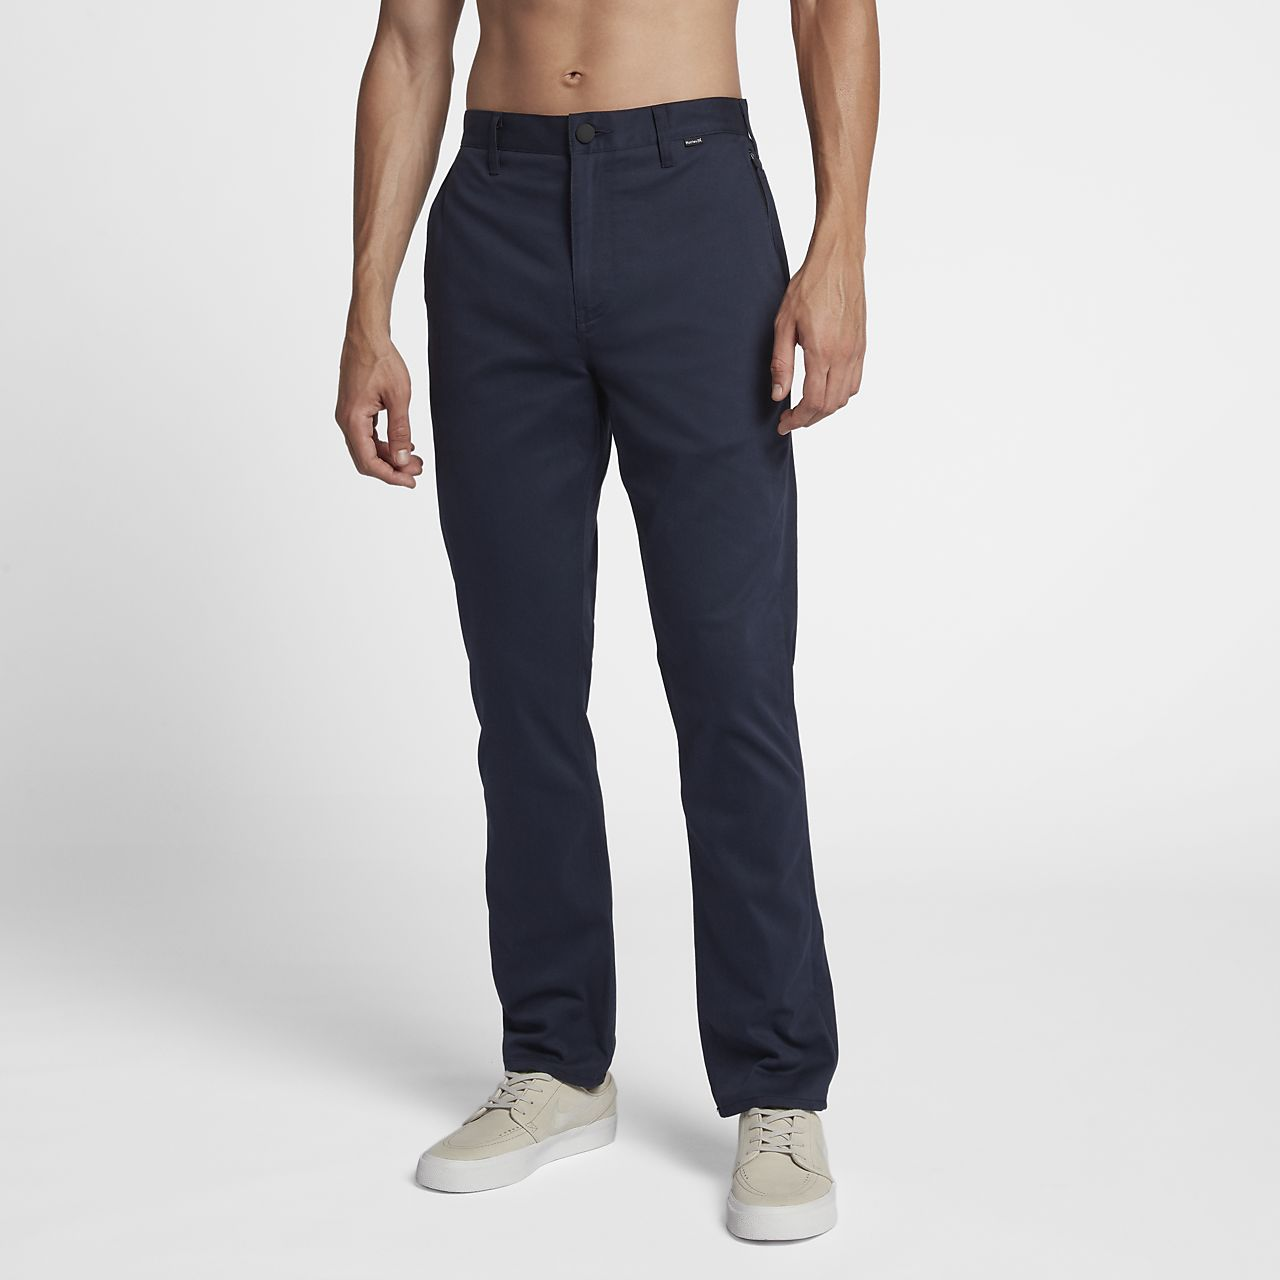 Pantaloni Hurley Dri-FIT Worker - Uomo